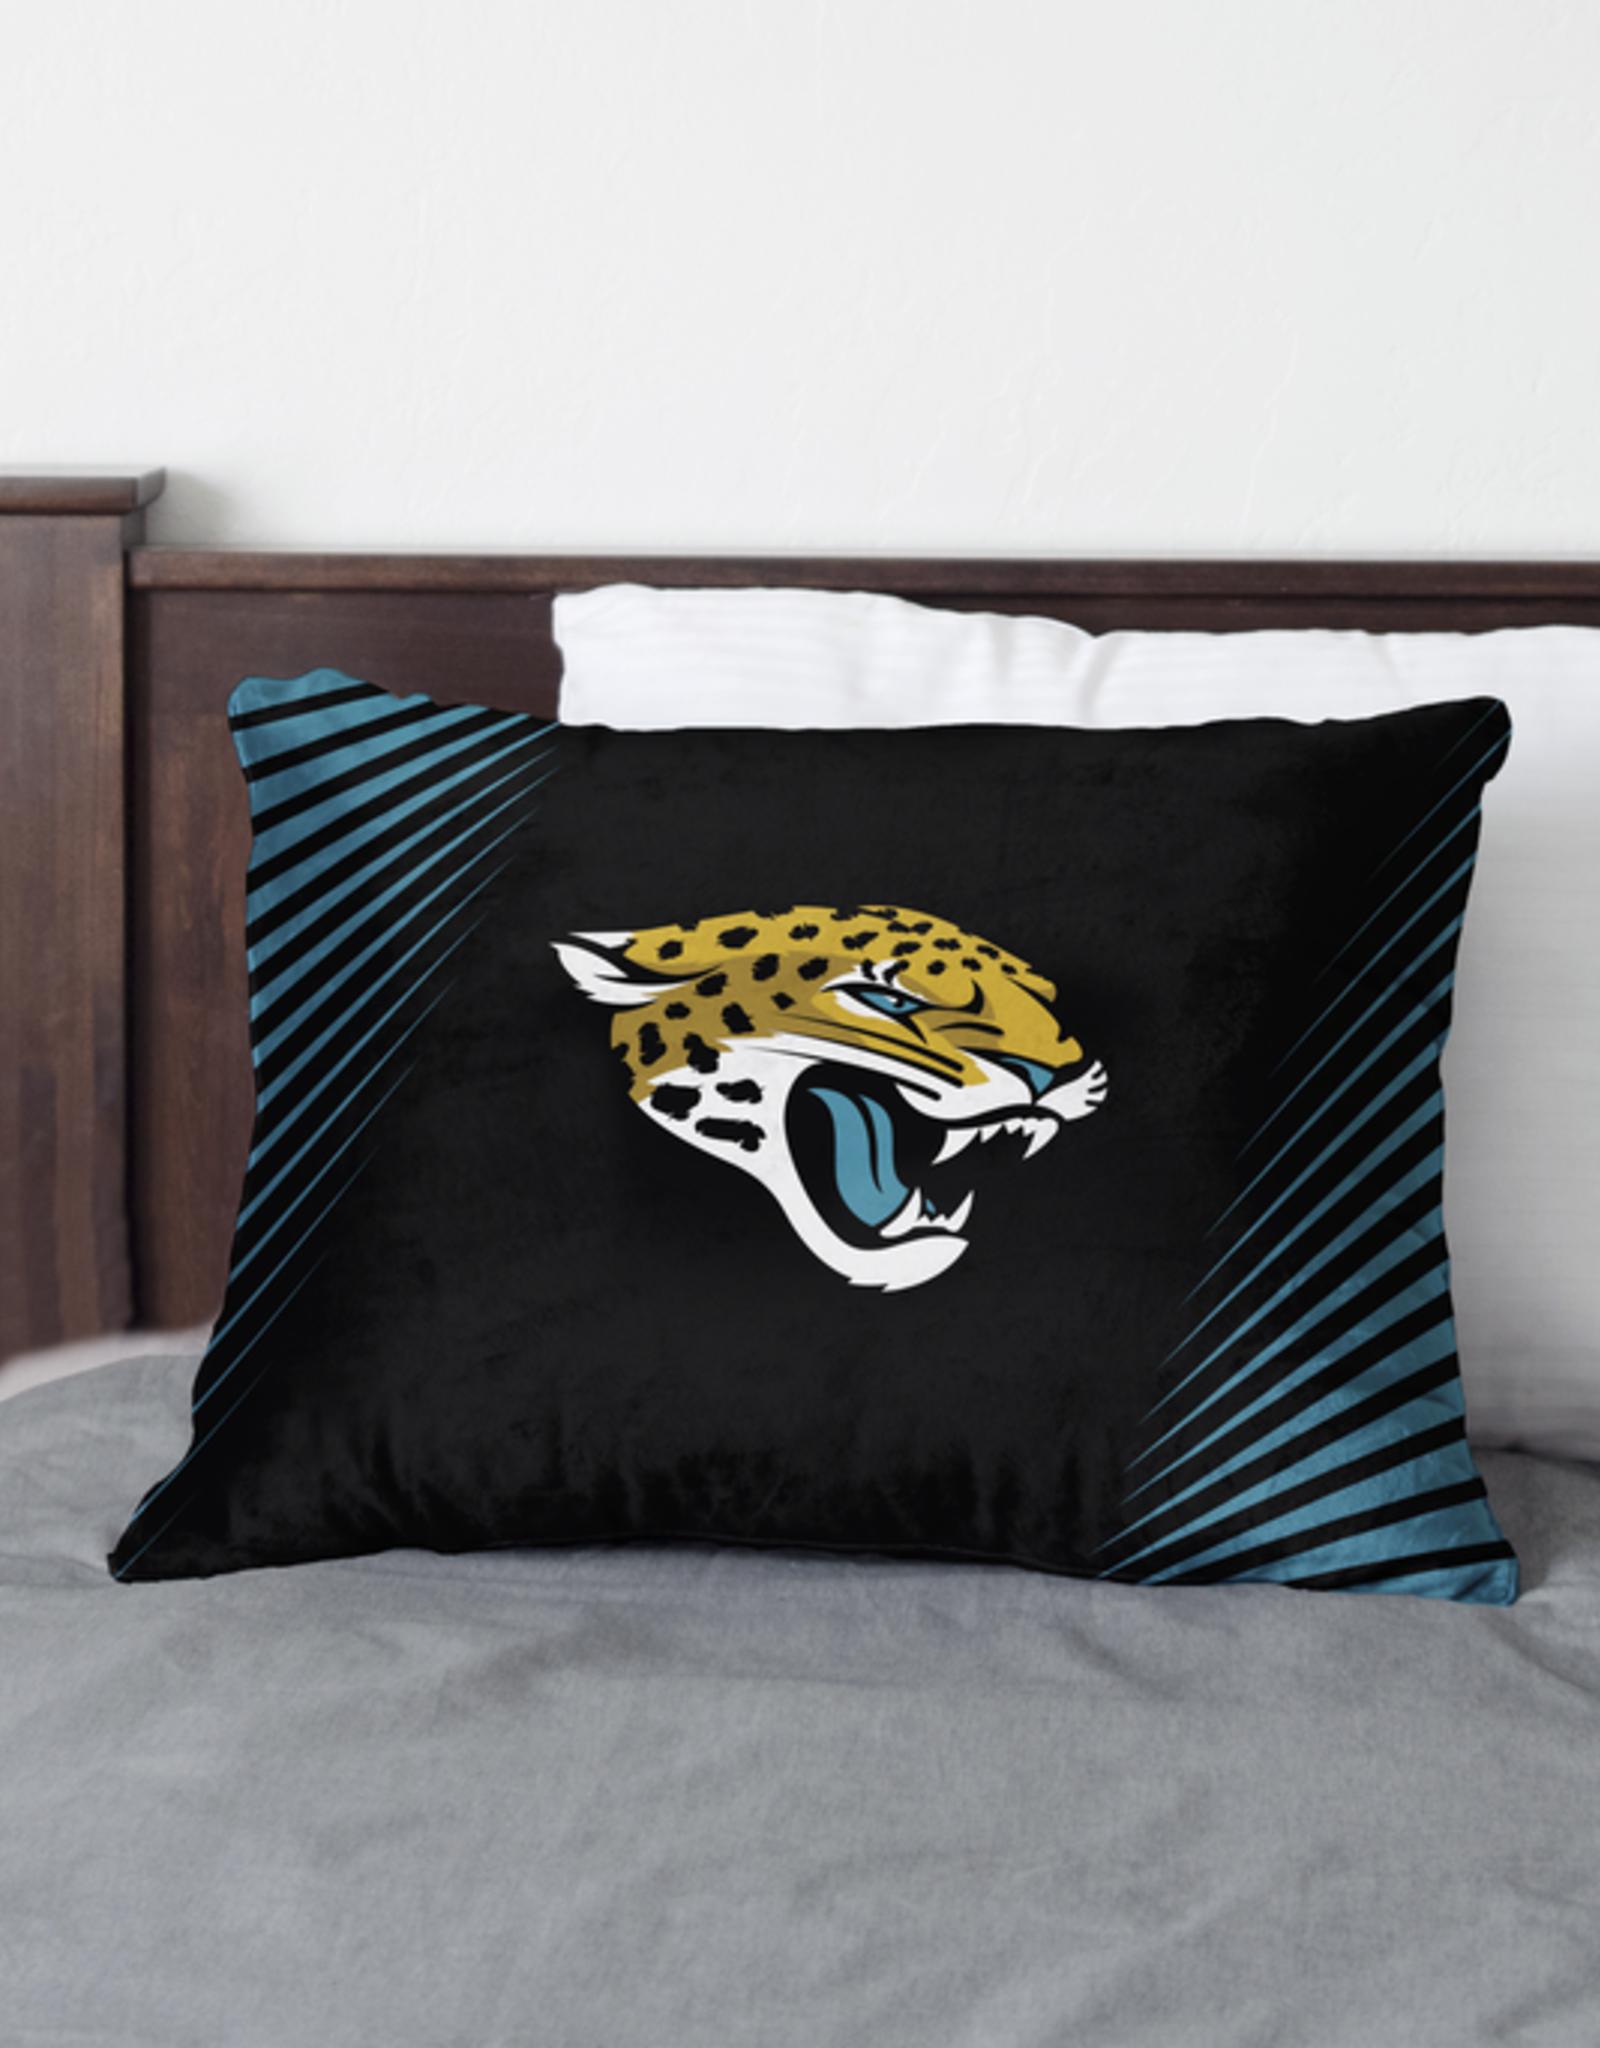 HOVER HELMETS Jacksonville Jaguars Side Streak Microplush Pillow Protector